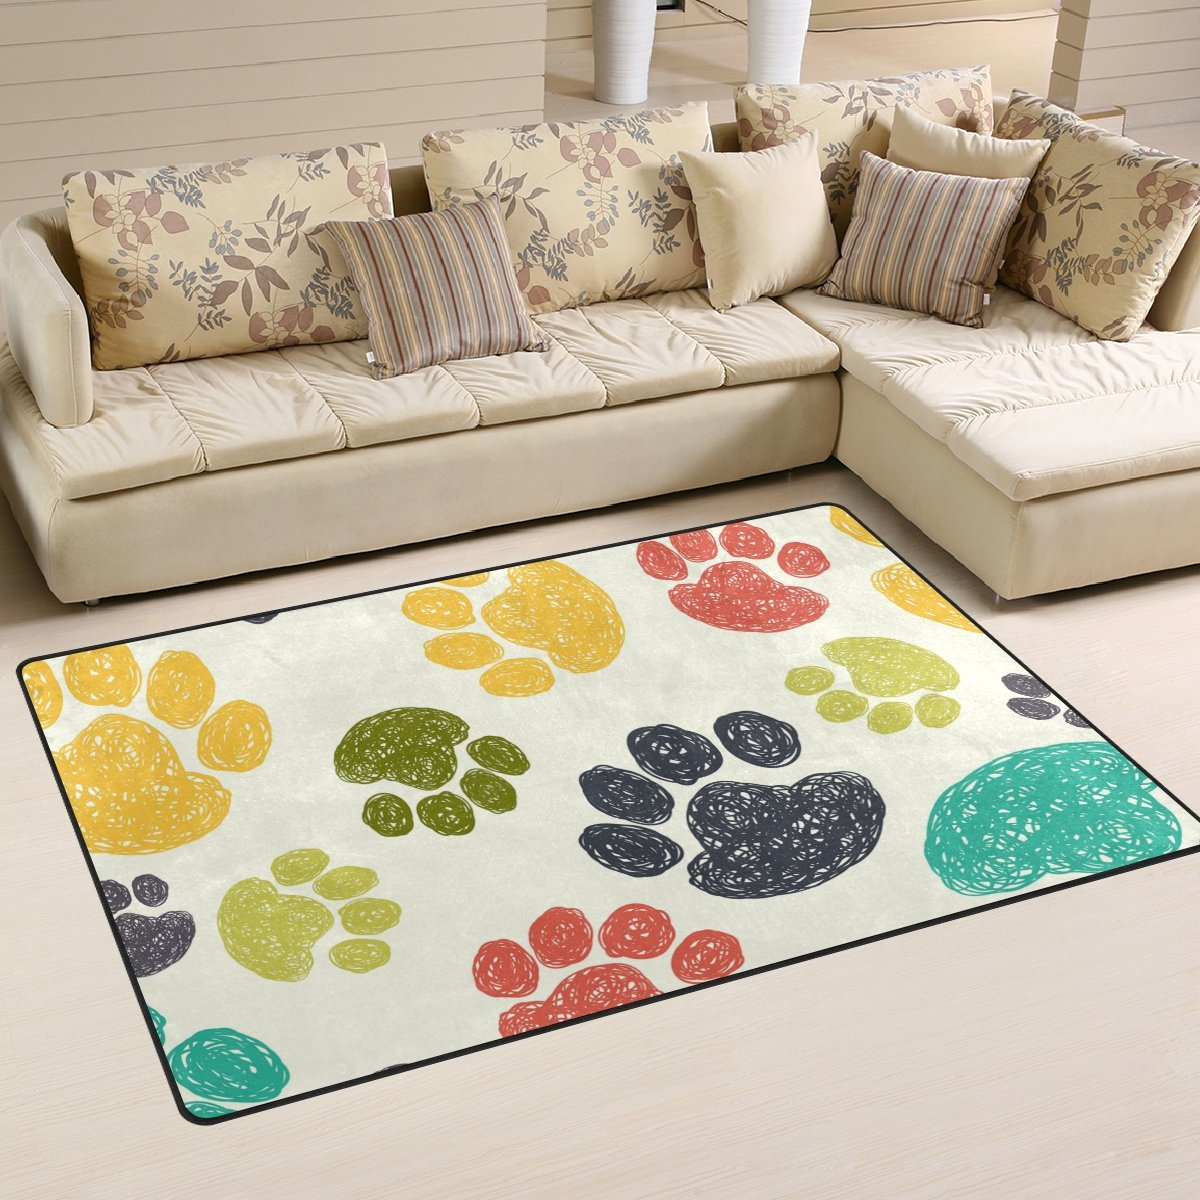 WellLee Area Rug,Cute Paw Print Floor Rug Non-Slip Doormat for Living Dining Dorm Room Bedroom Decor 31x20 inch